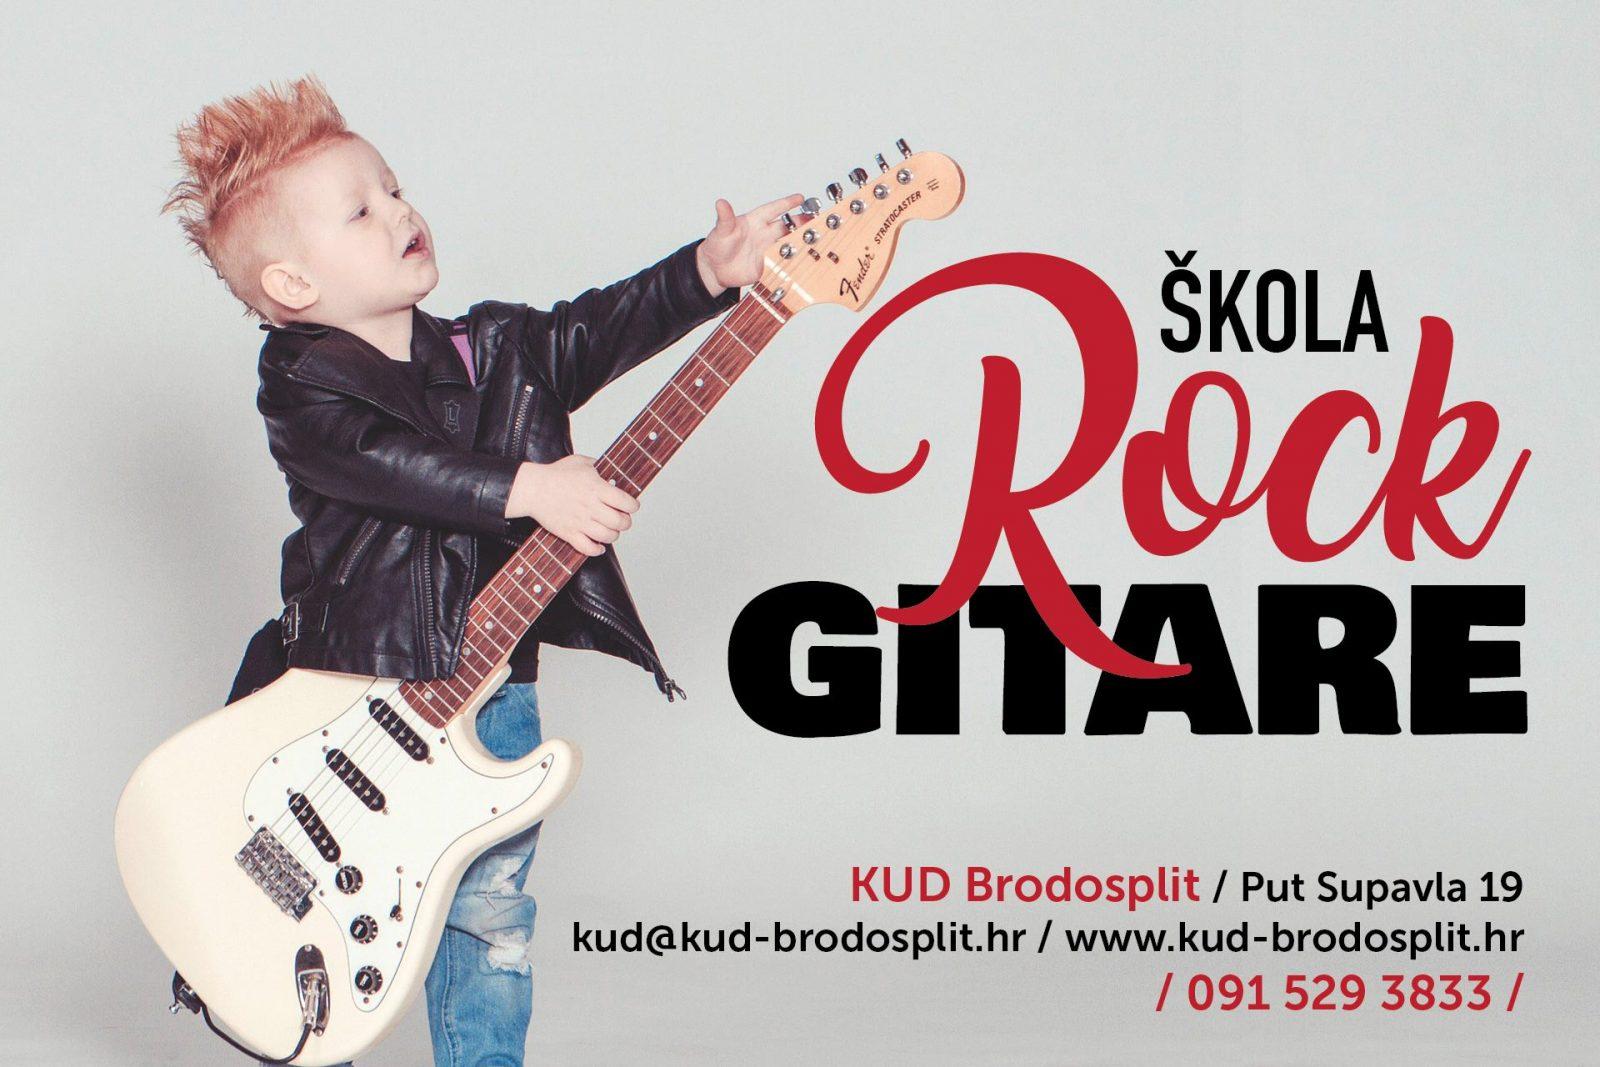 skola_rock_gitare